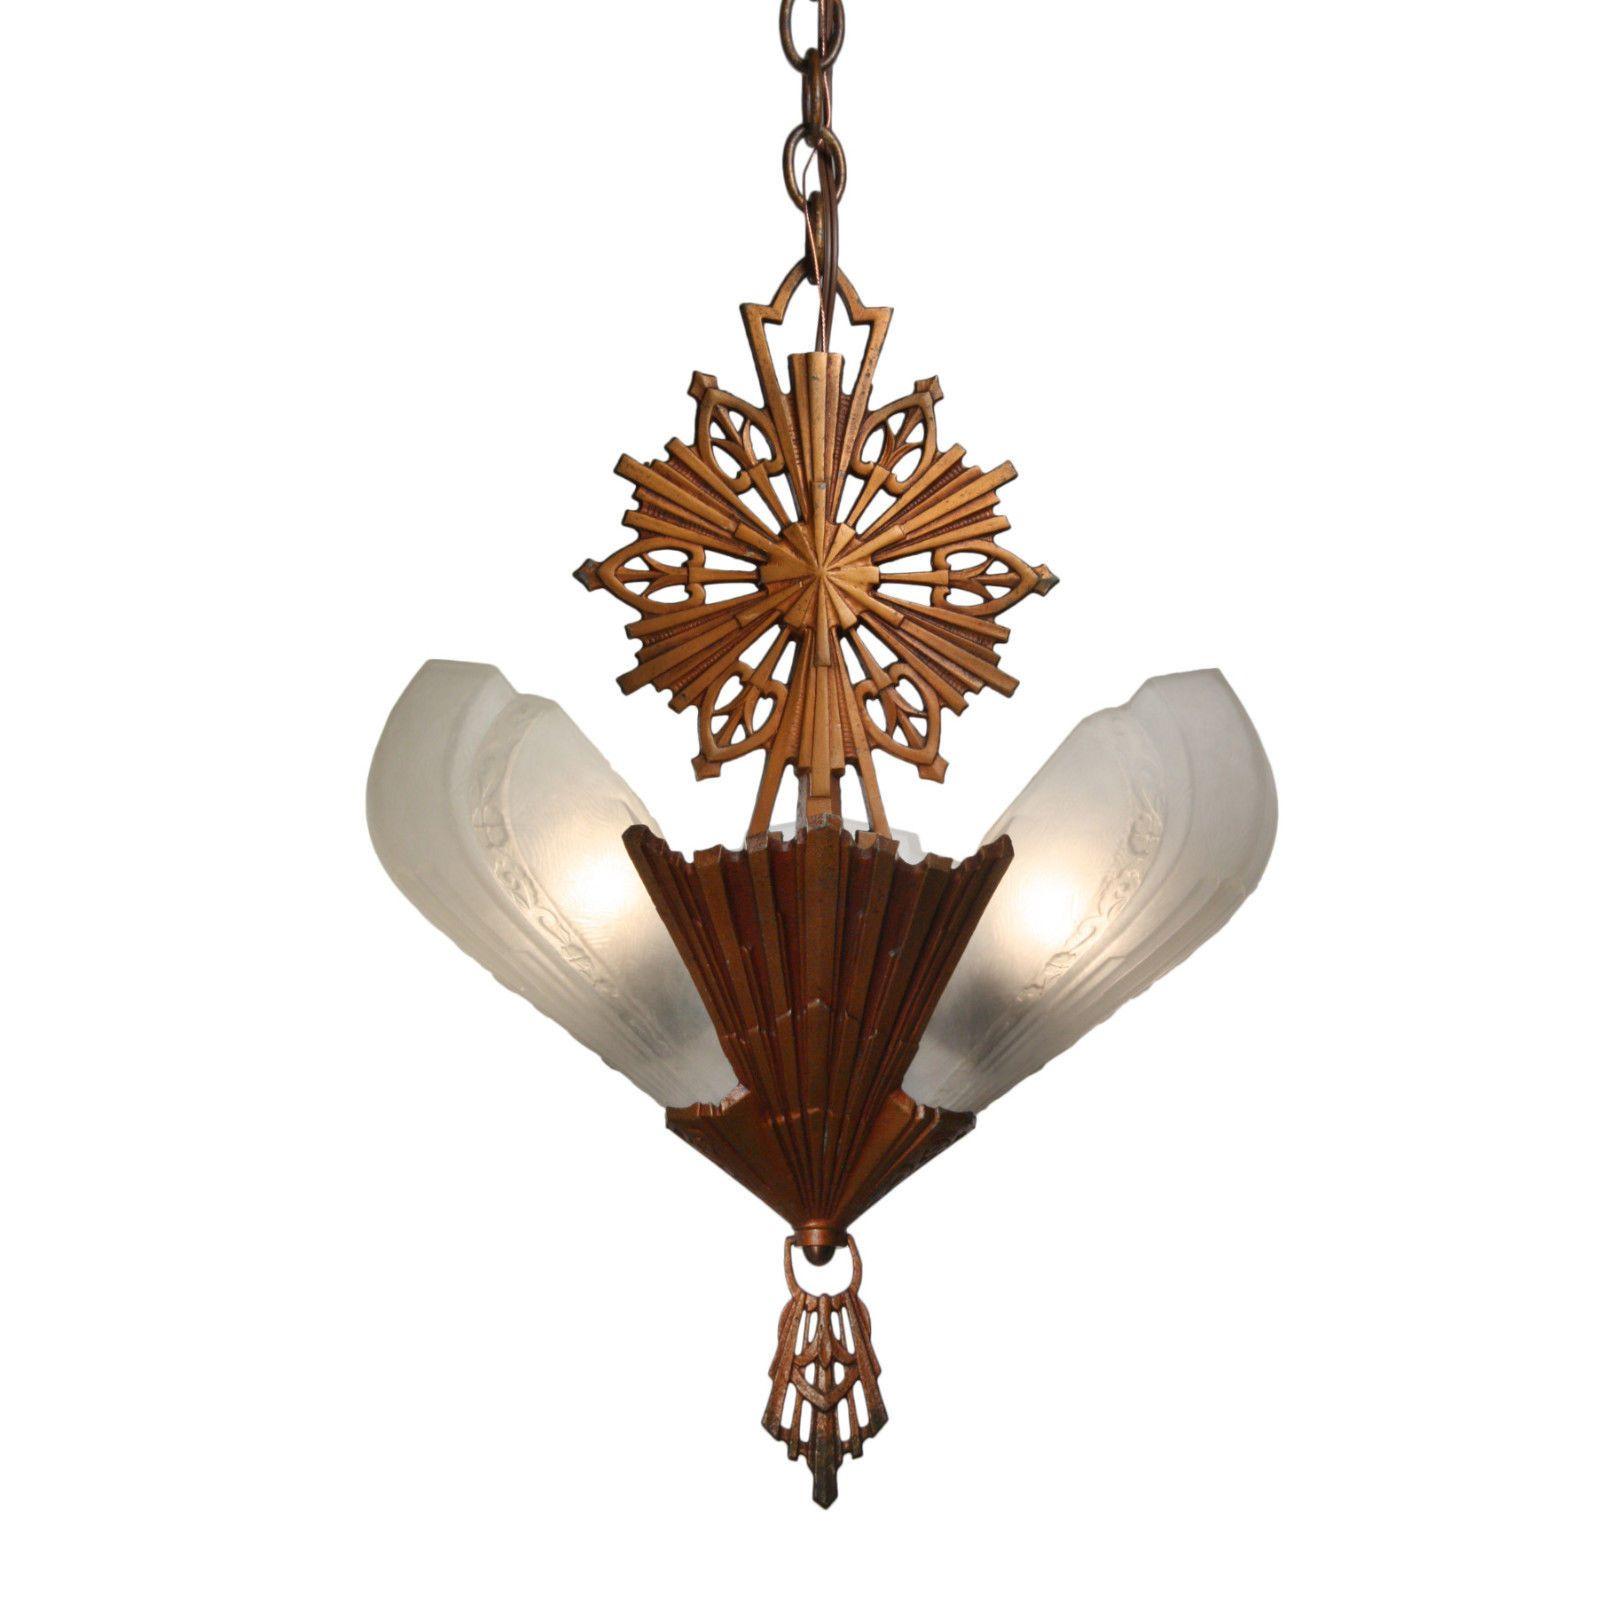 Antique art deco slip shade chandelier c1930 nc2642 ebay slip antique art deco slip shade chandelier c1930 nc2642 ebay arubaitofo Choice Image